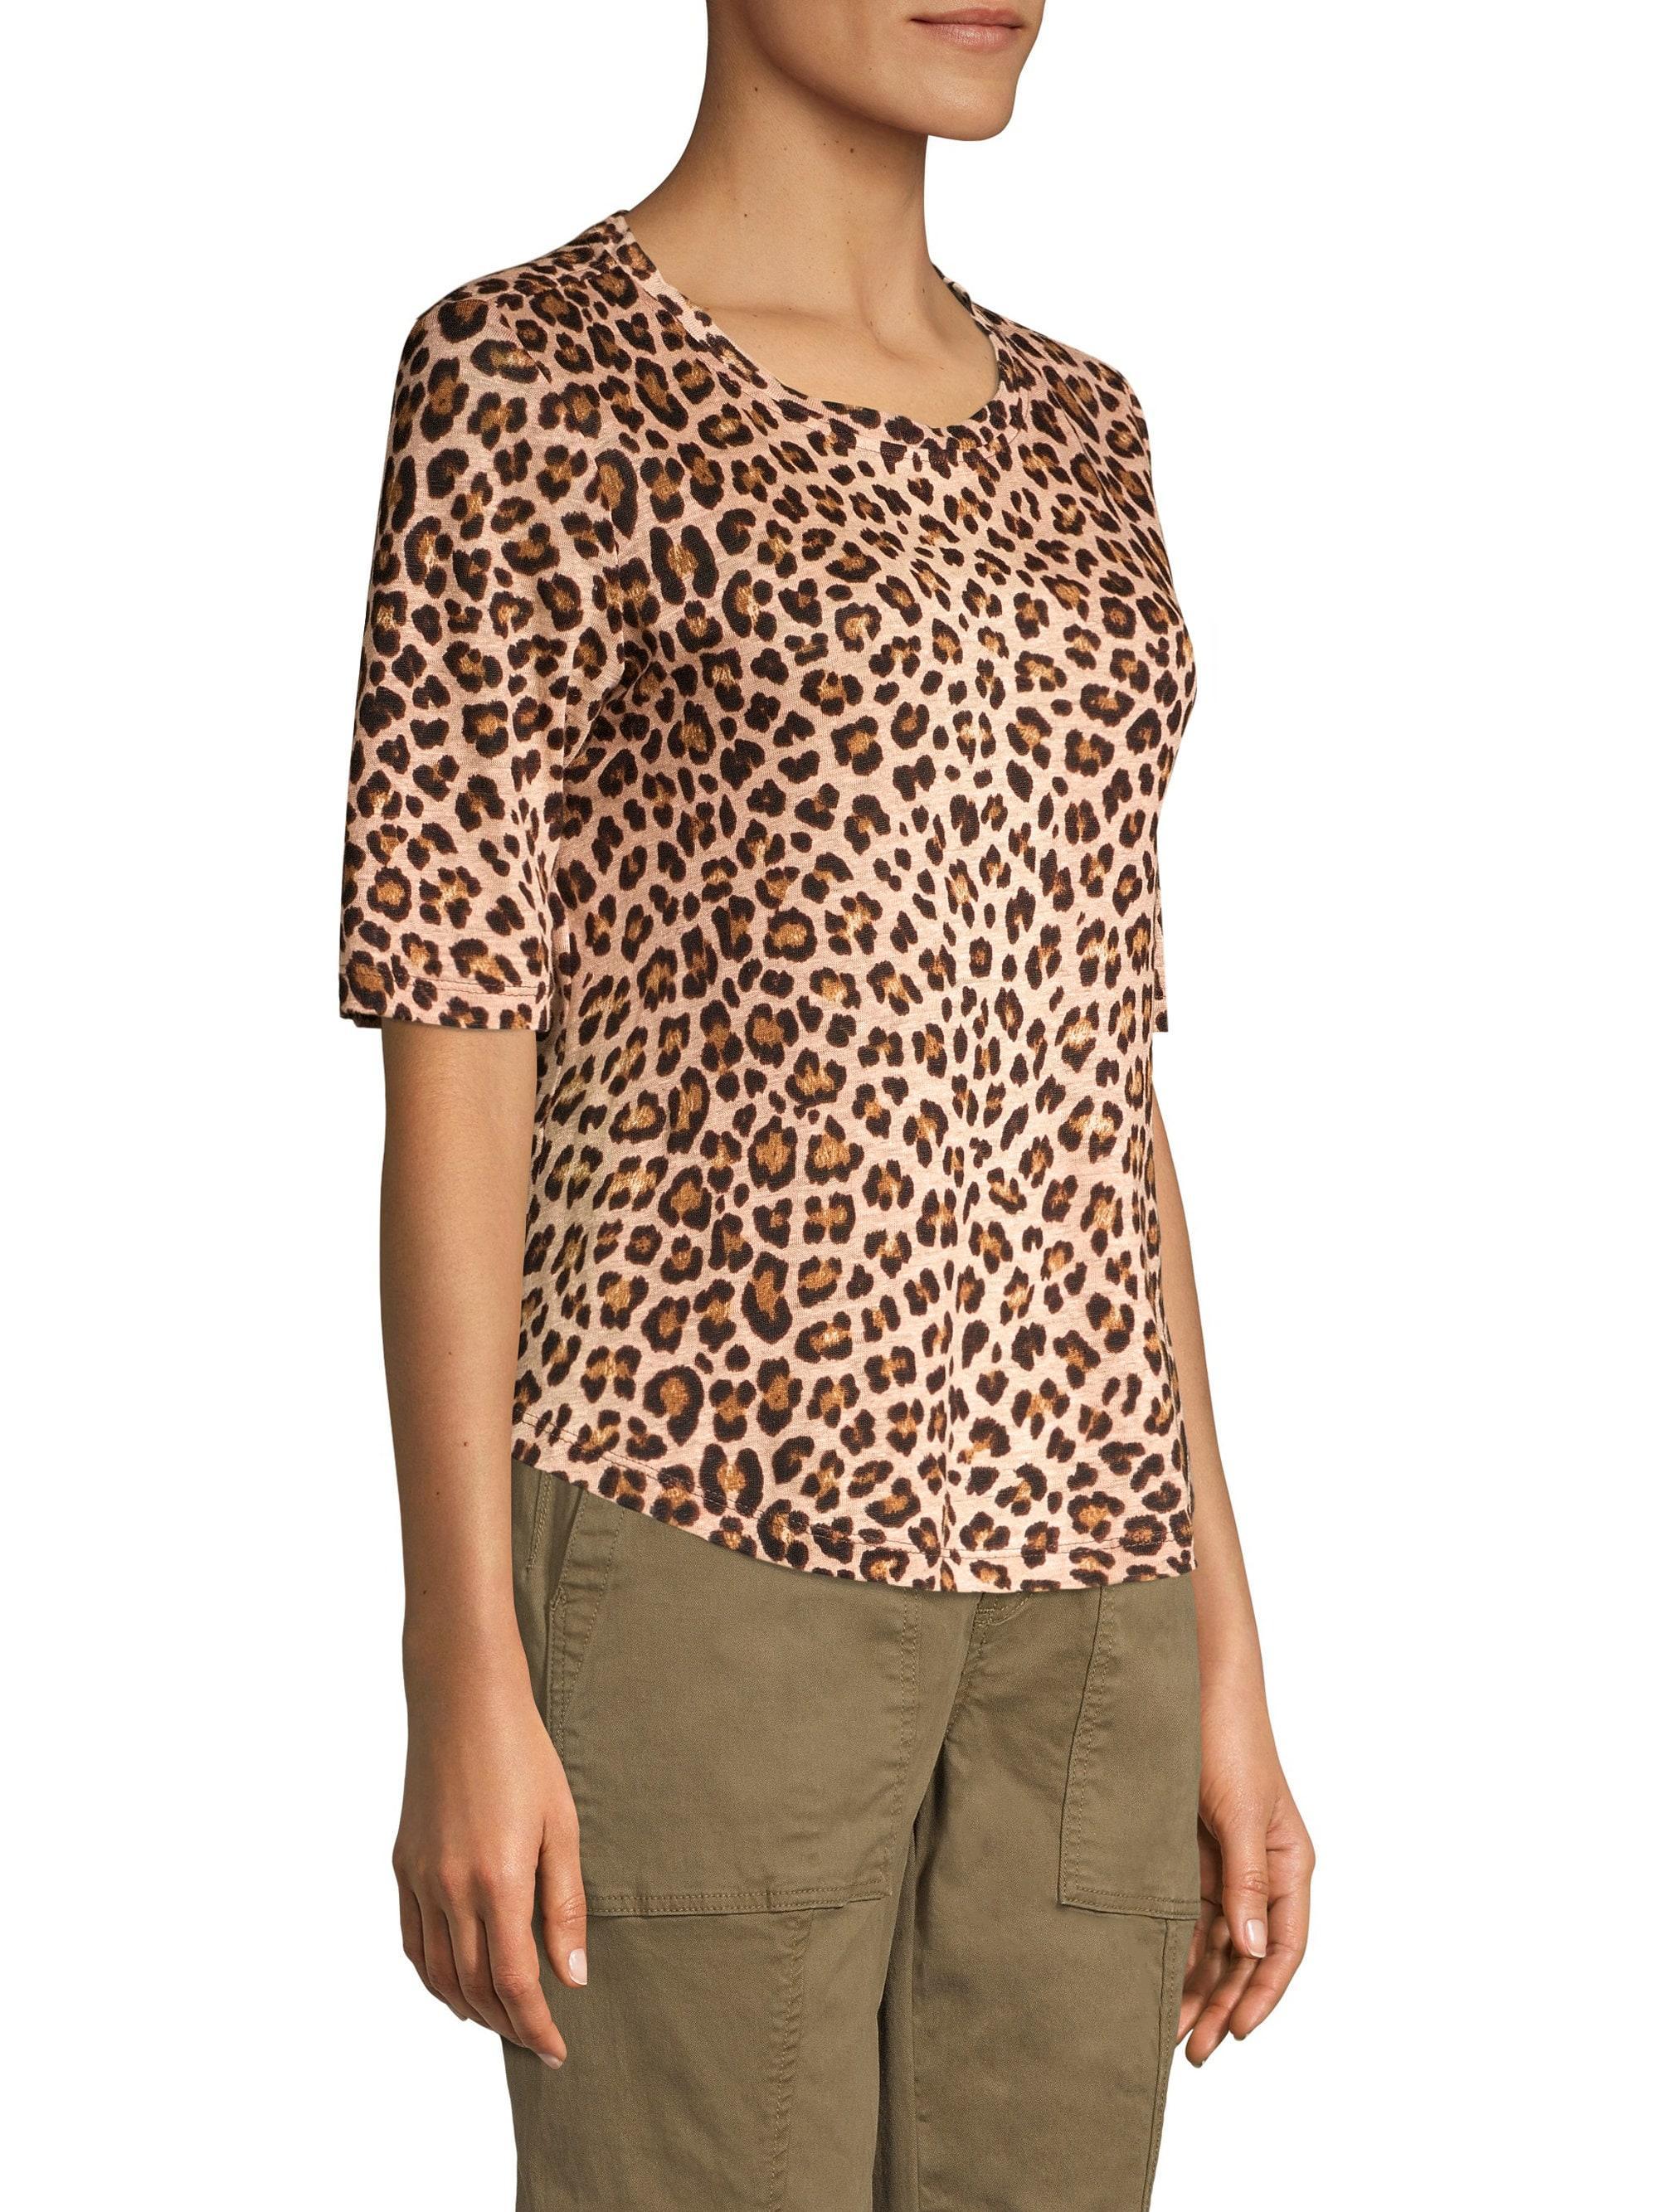 07b7661256fb Lyst - Rebecca Taylor Women's Leopard Print Tee - Biscuit